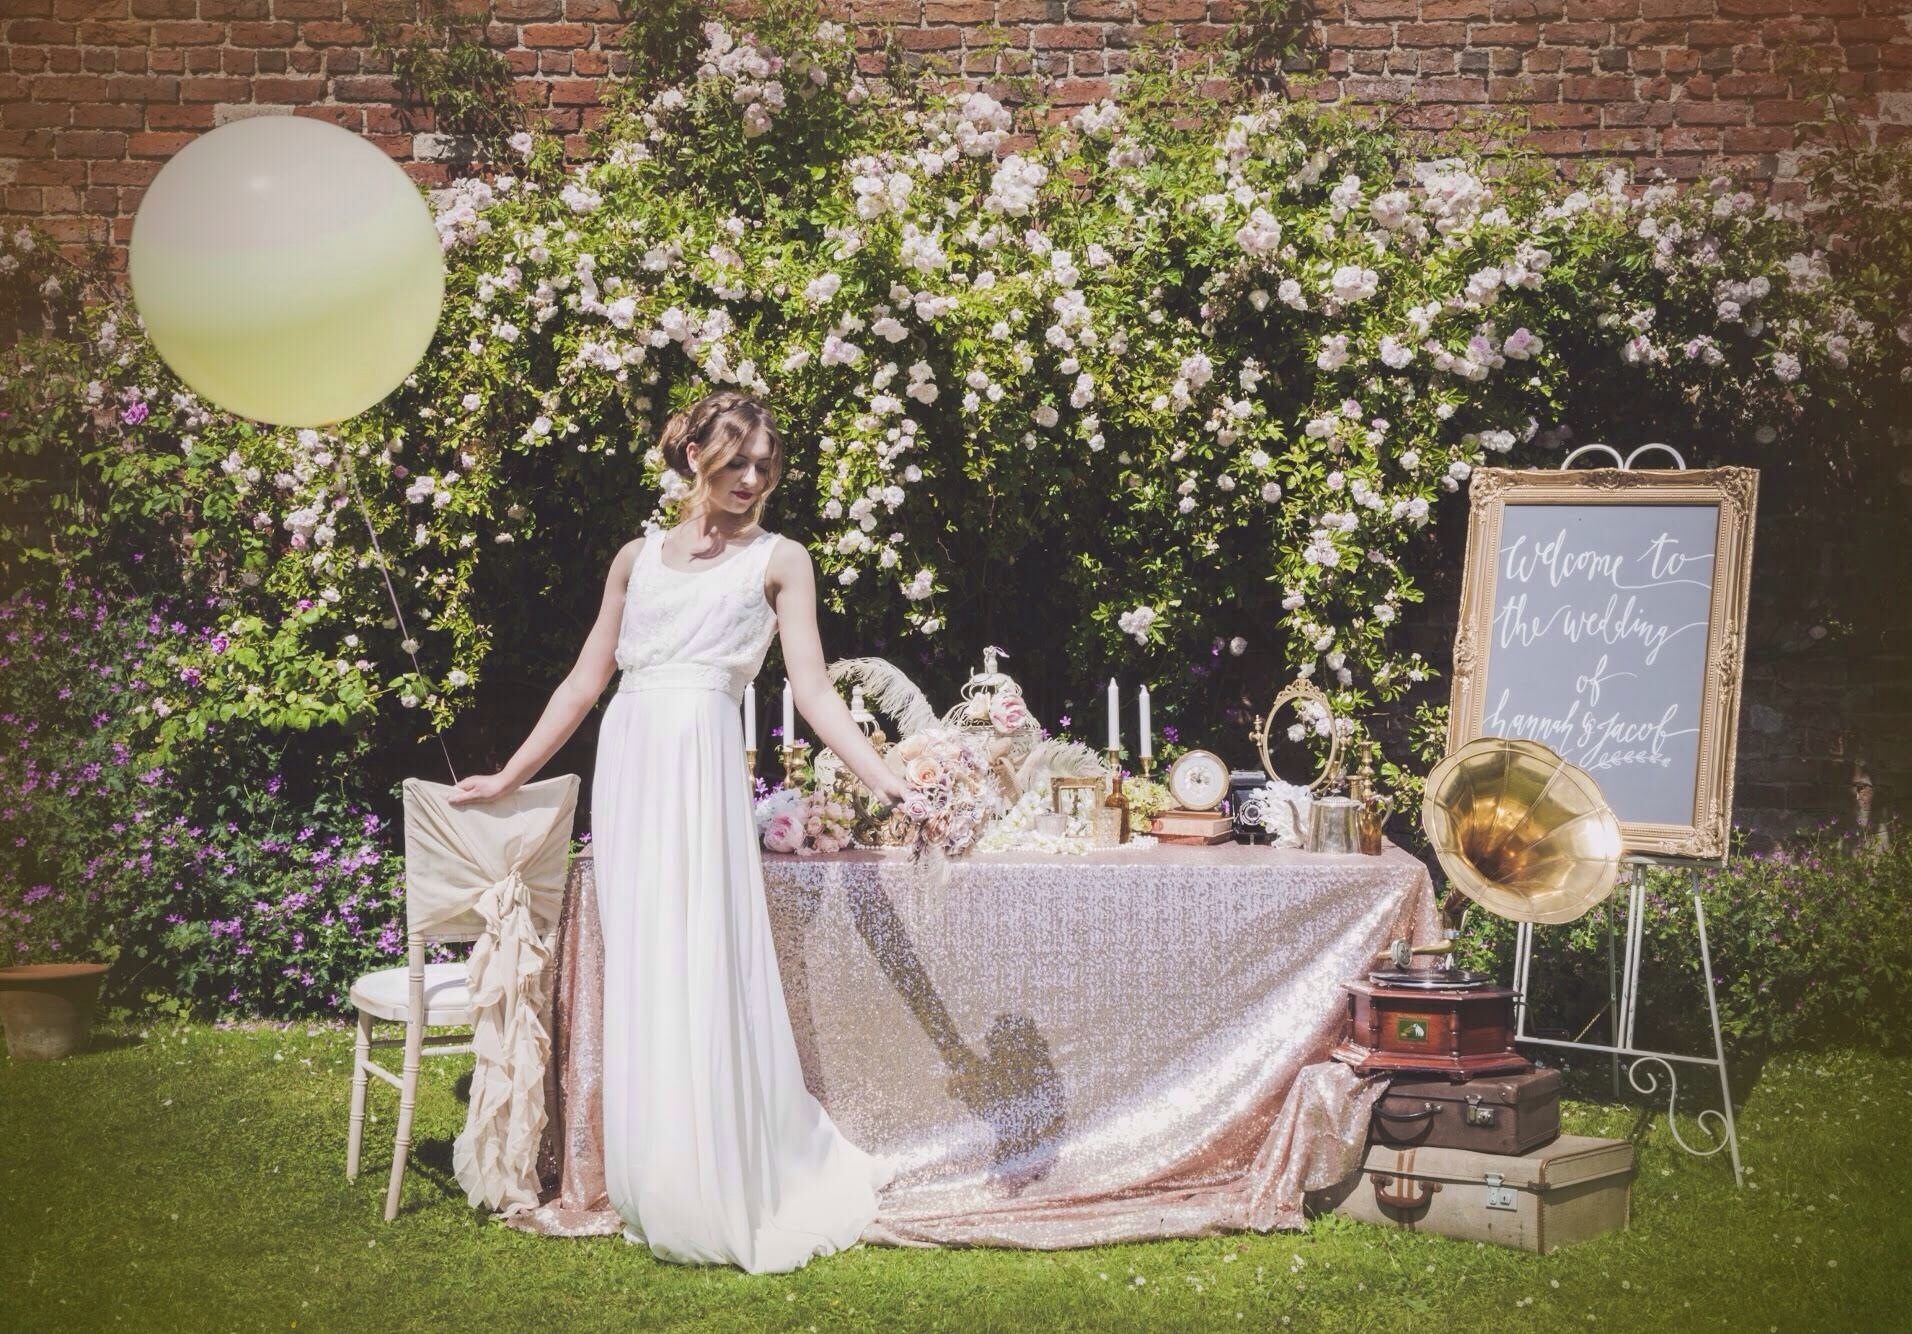 Wedding Trends 2017.New Wedding Trends For 2017 2018